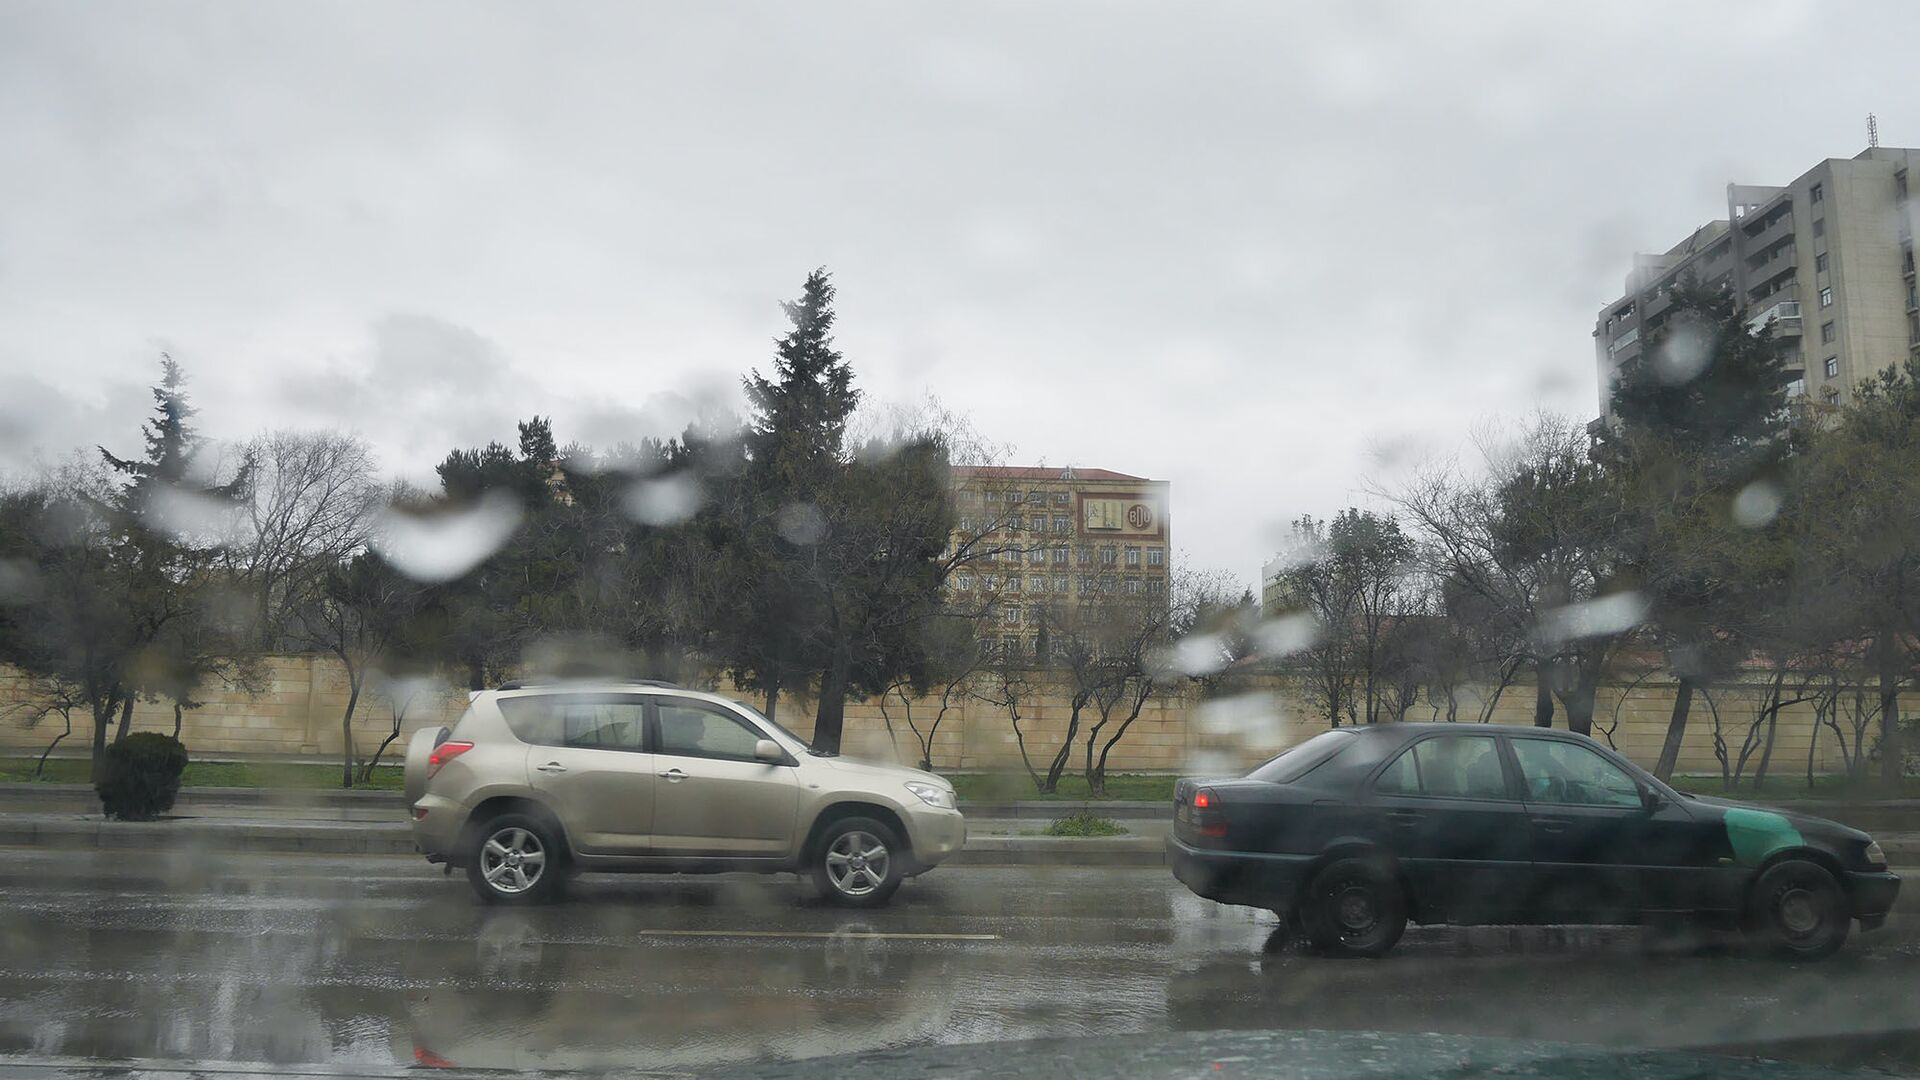 Дождливая погода в Баку - Sputnik Азербайджан, 1920, 05.09.2021